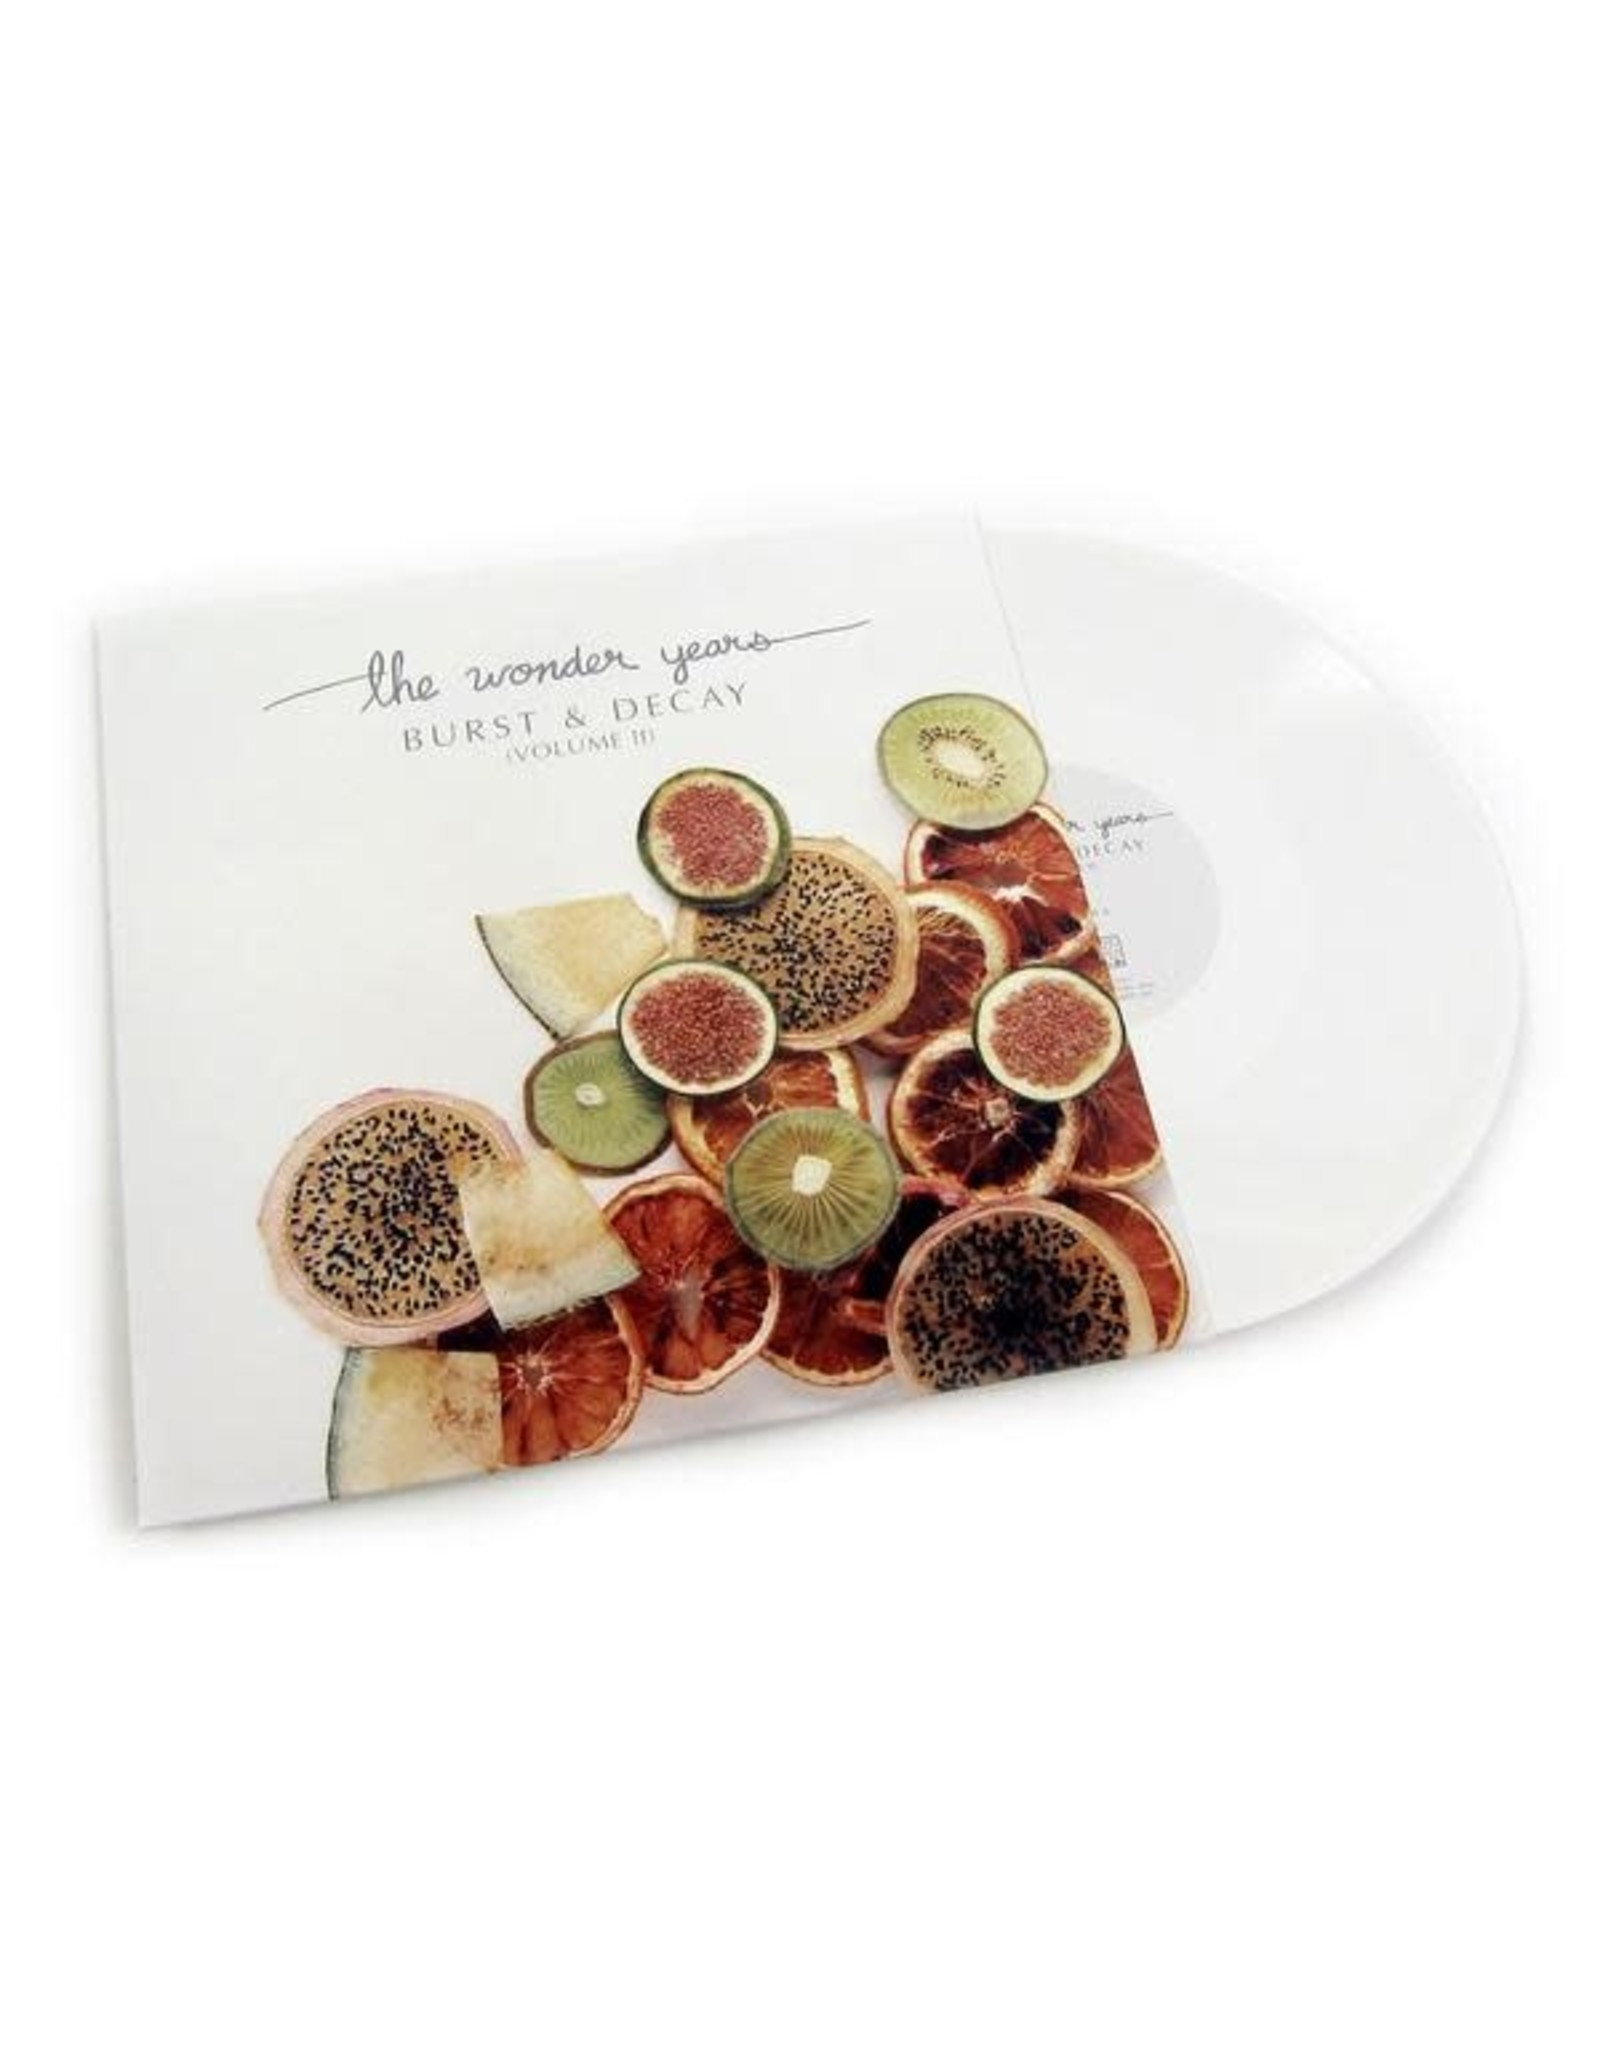 Wonder Years, The - Burst & Decay (Volume II) LP